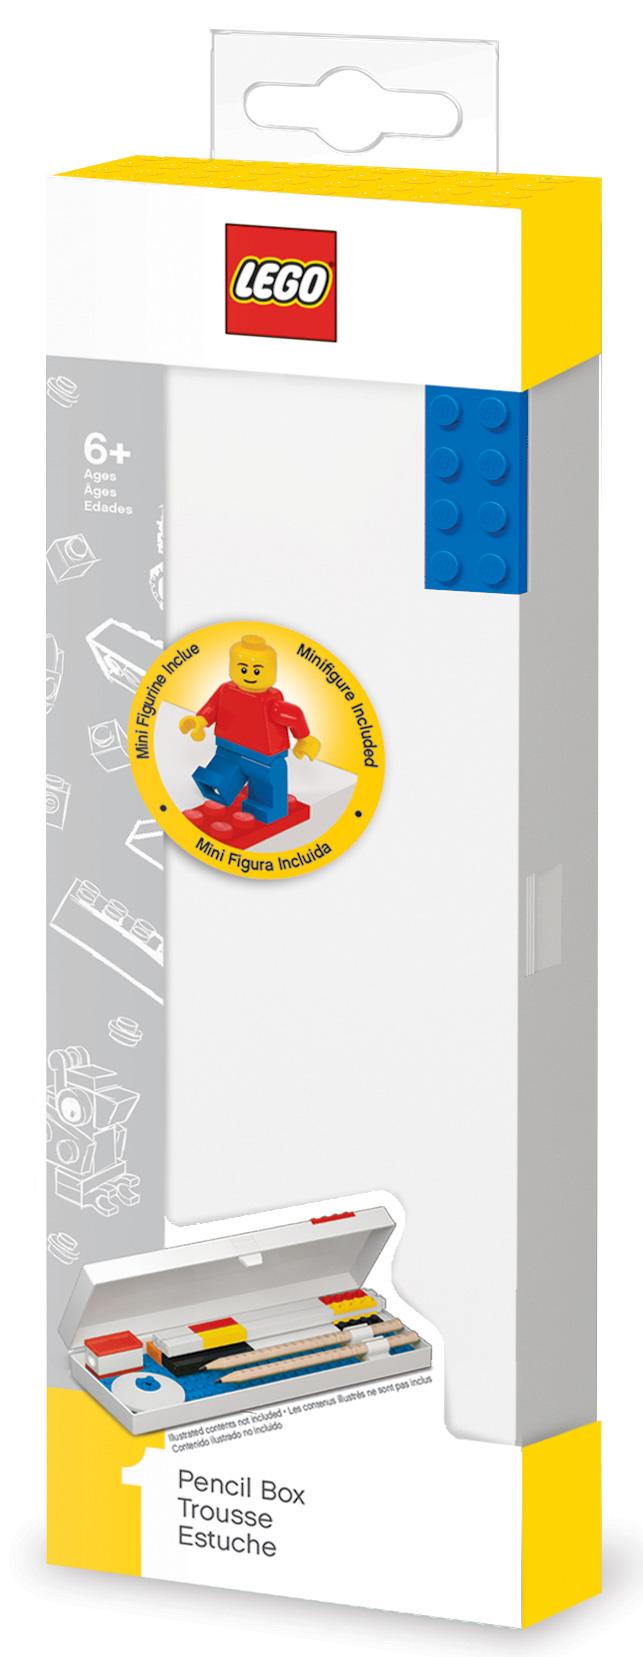 Пенал LEGO (синий кубик) + минифигурка LEGO: Classic